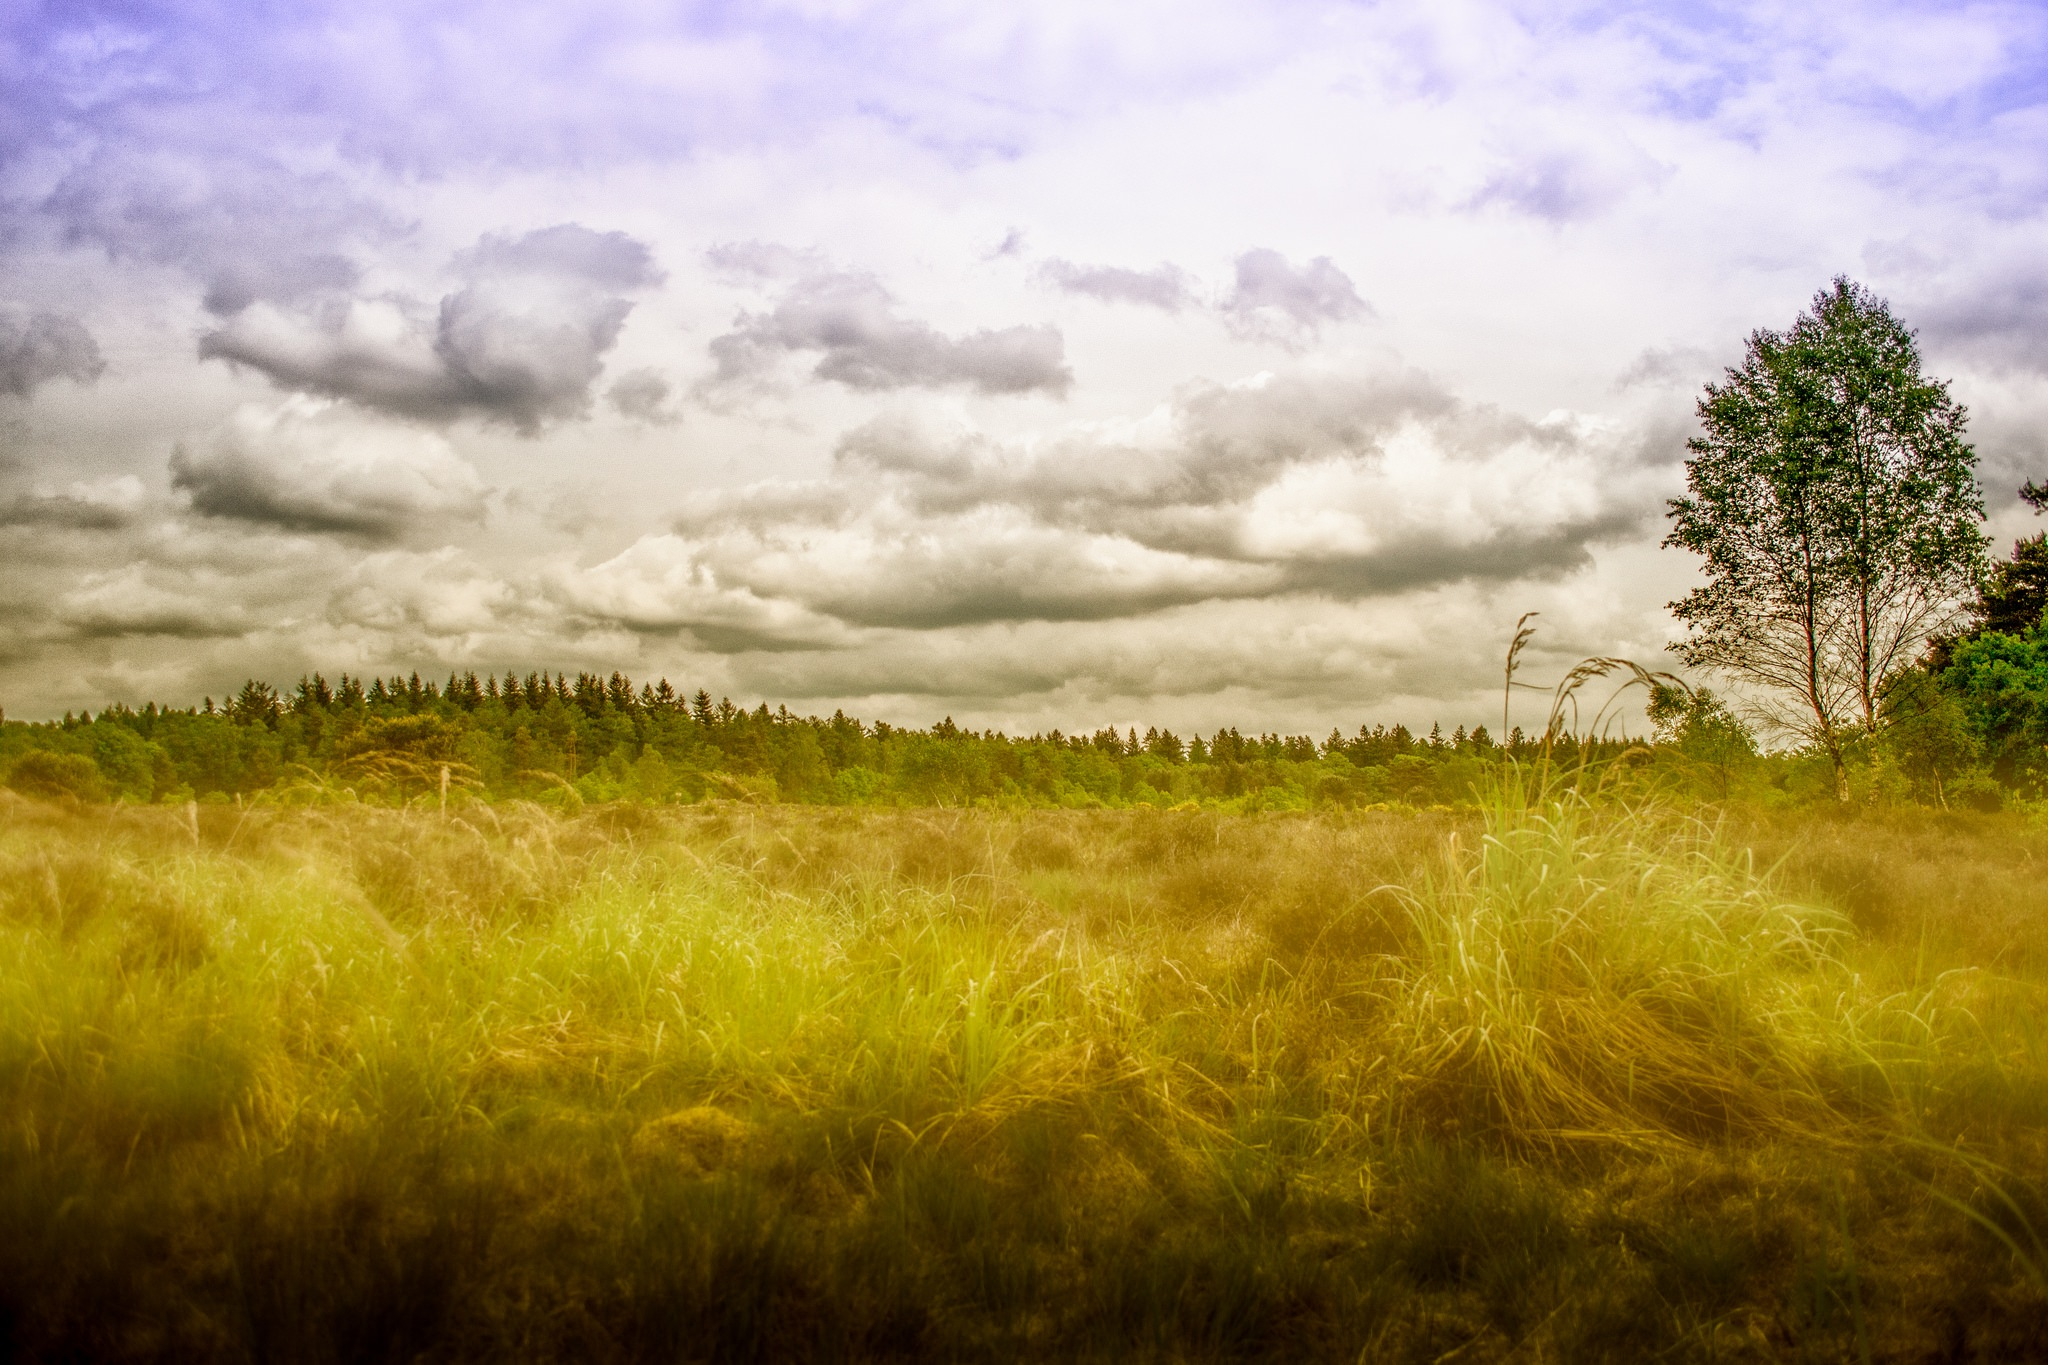 landscape by DannyGeveling